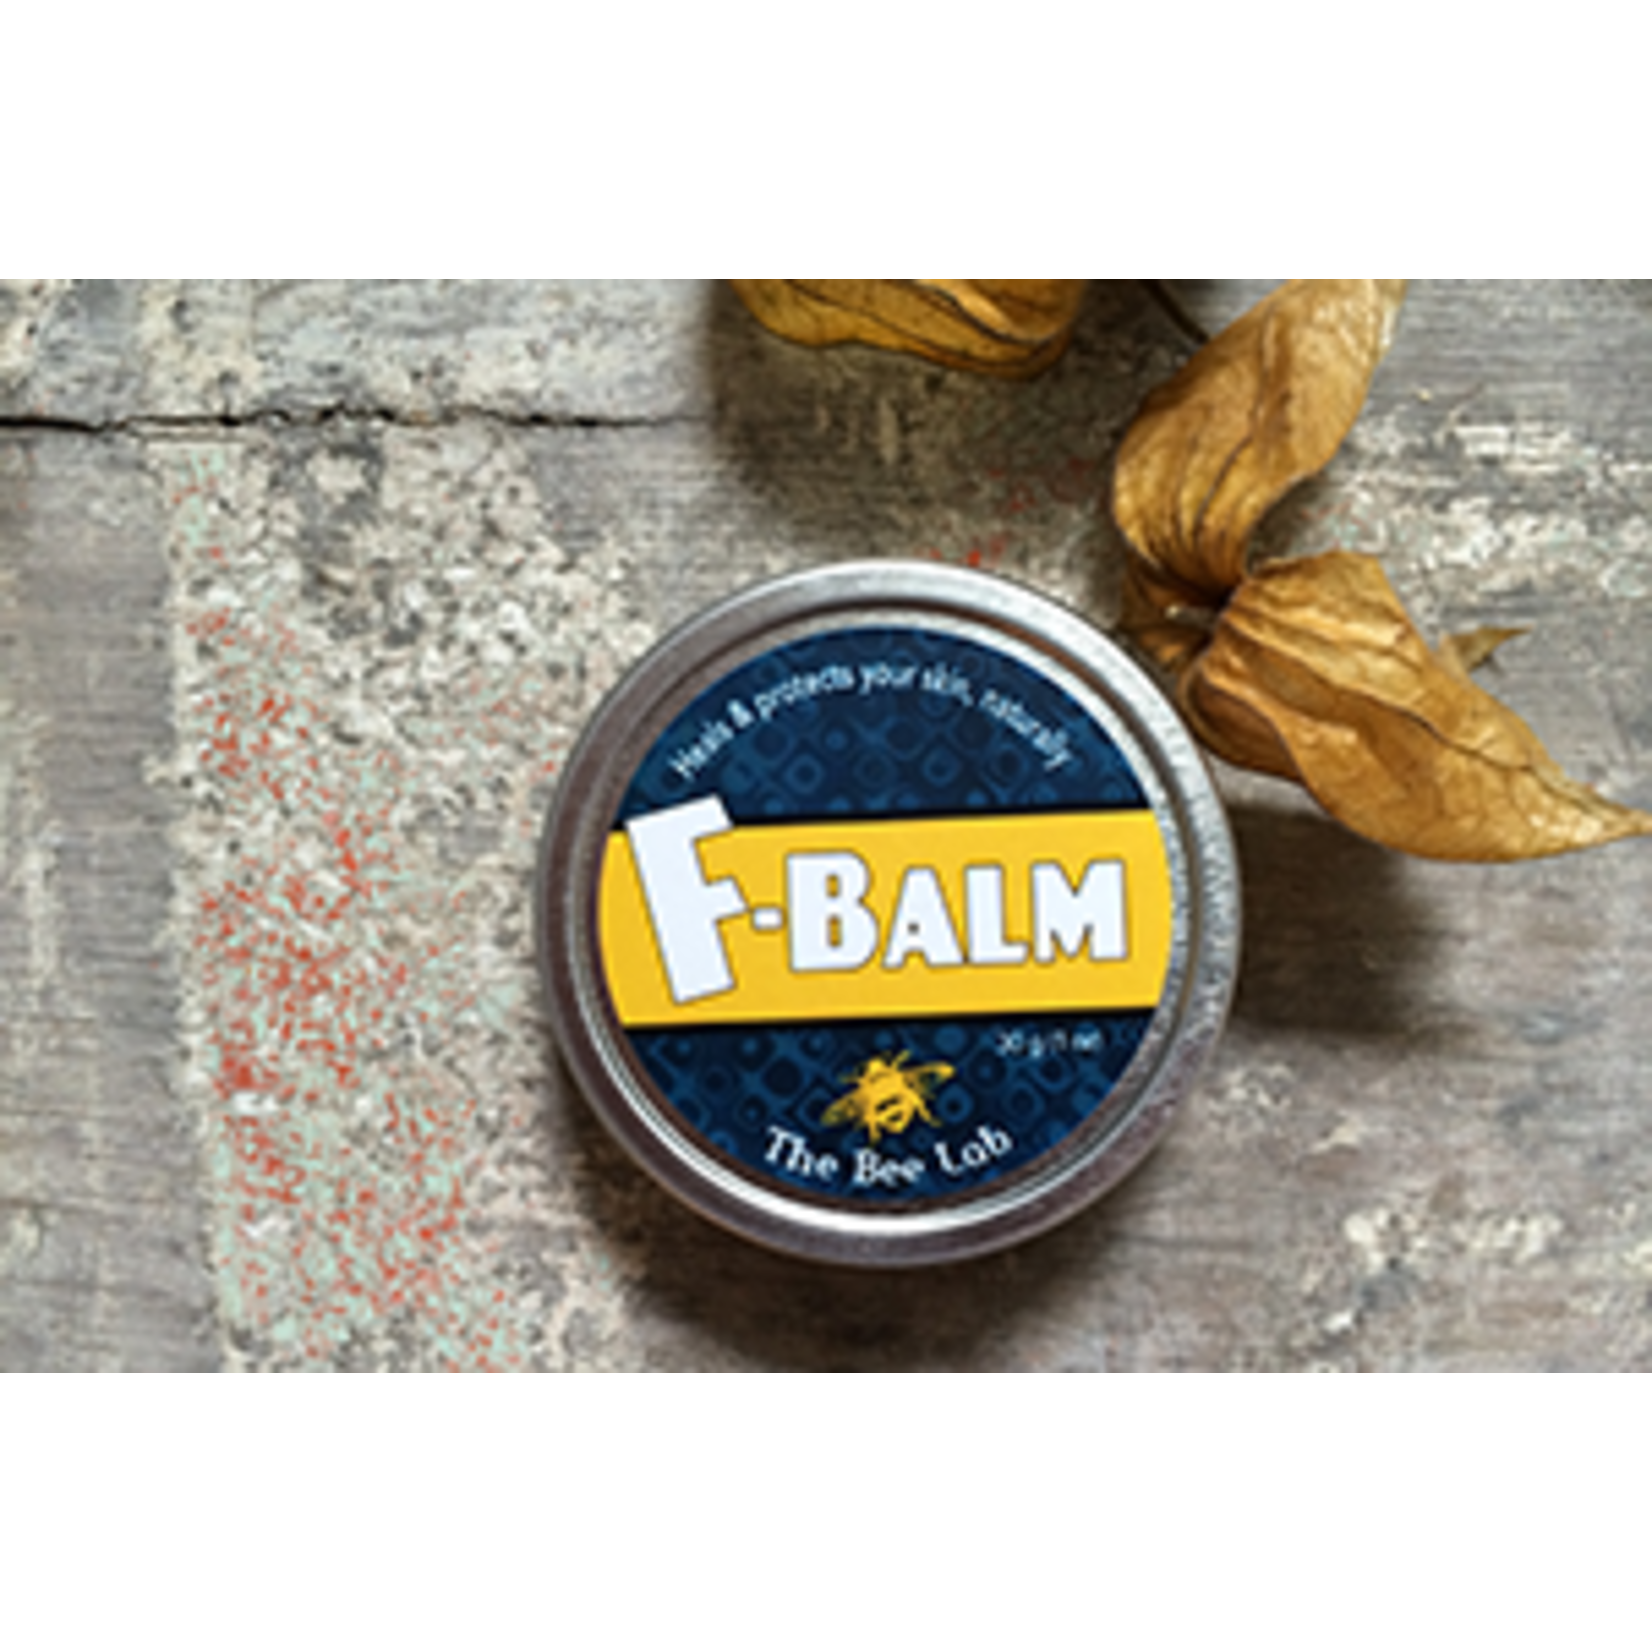 Baume Bee Lab F-Balm 15 g - Parfumé